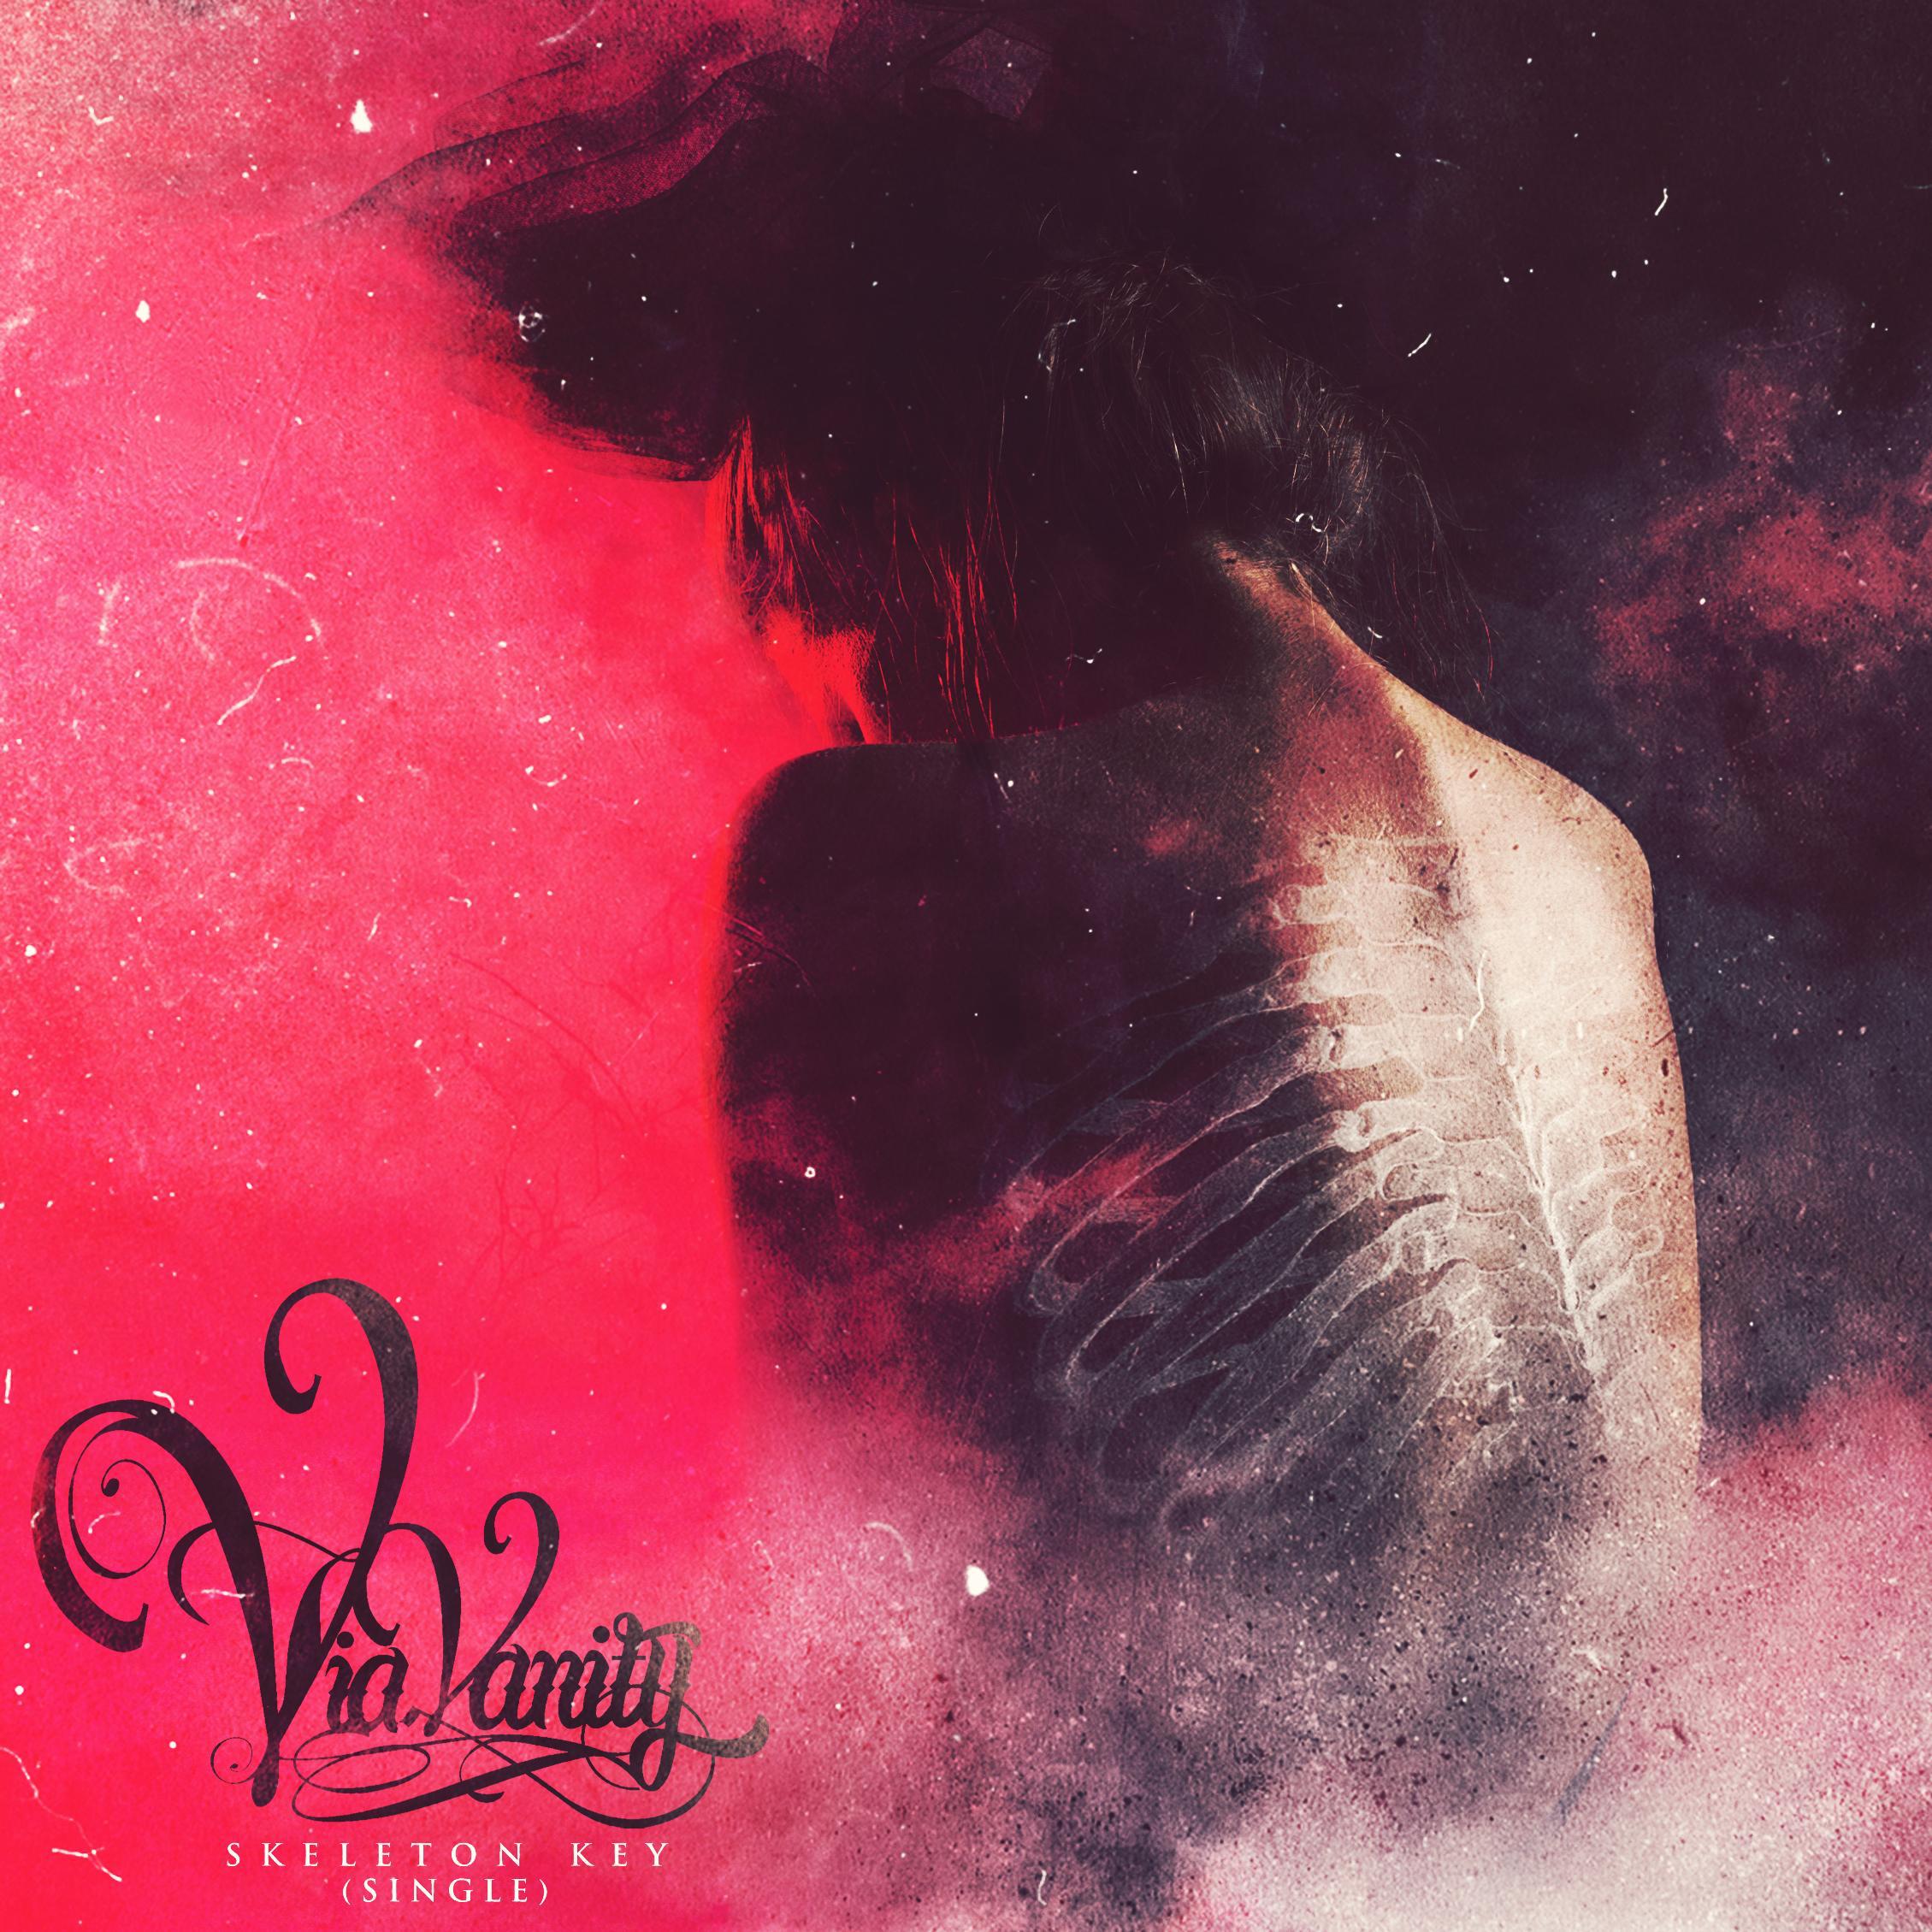 Via Vanity - Skeleton Key [single] (2014)